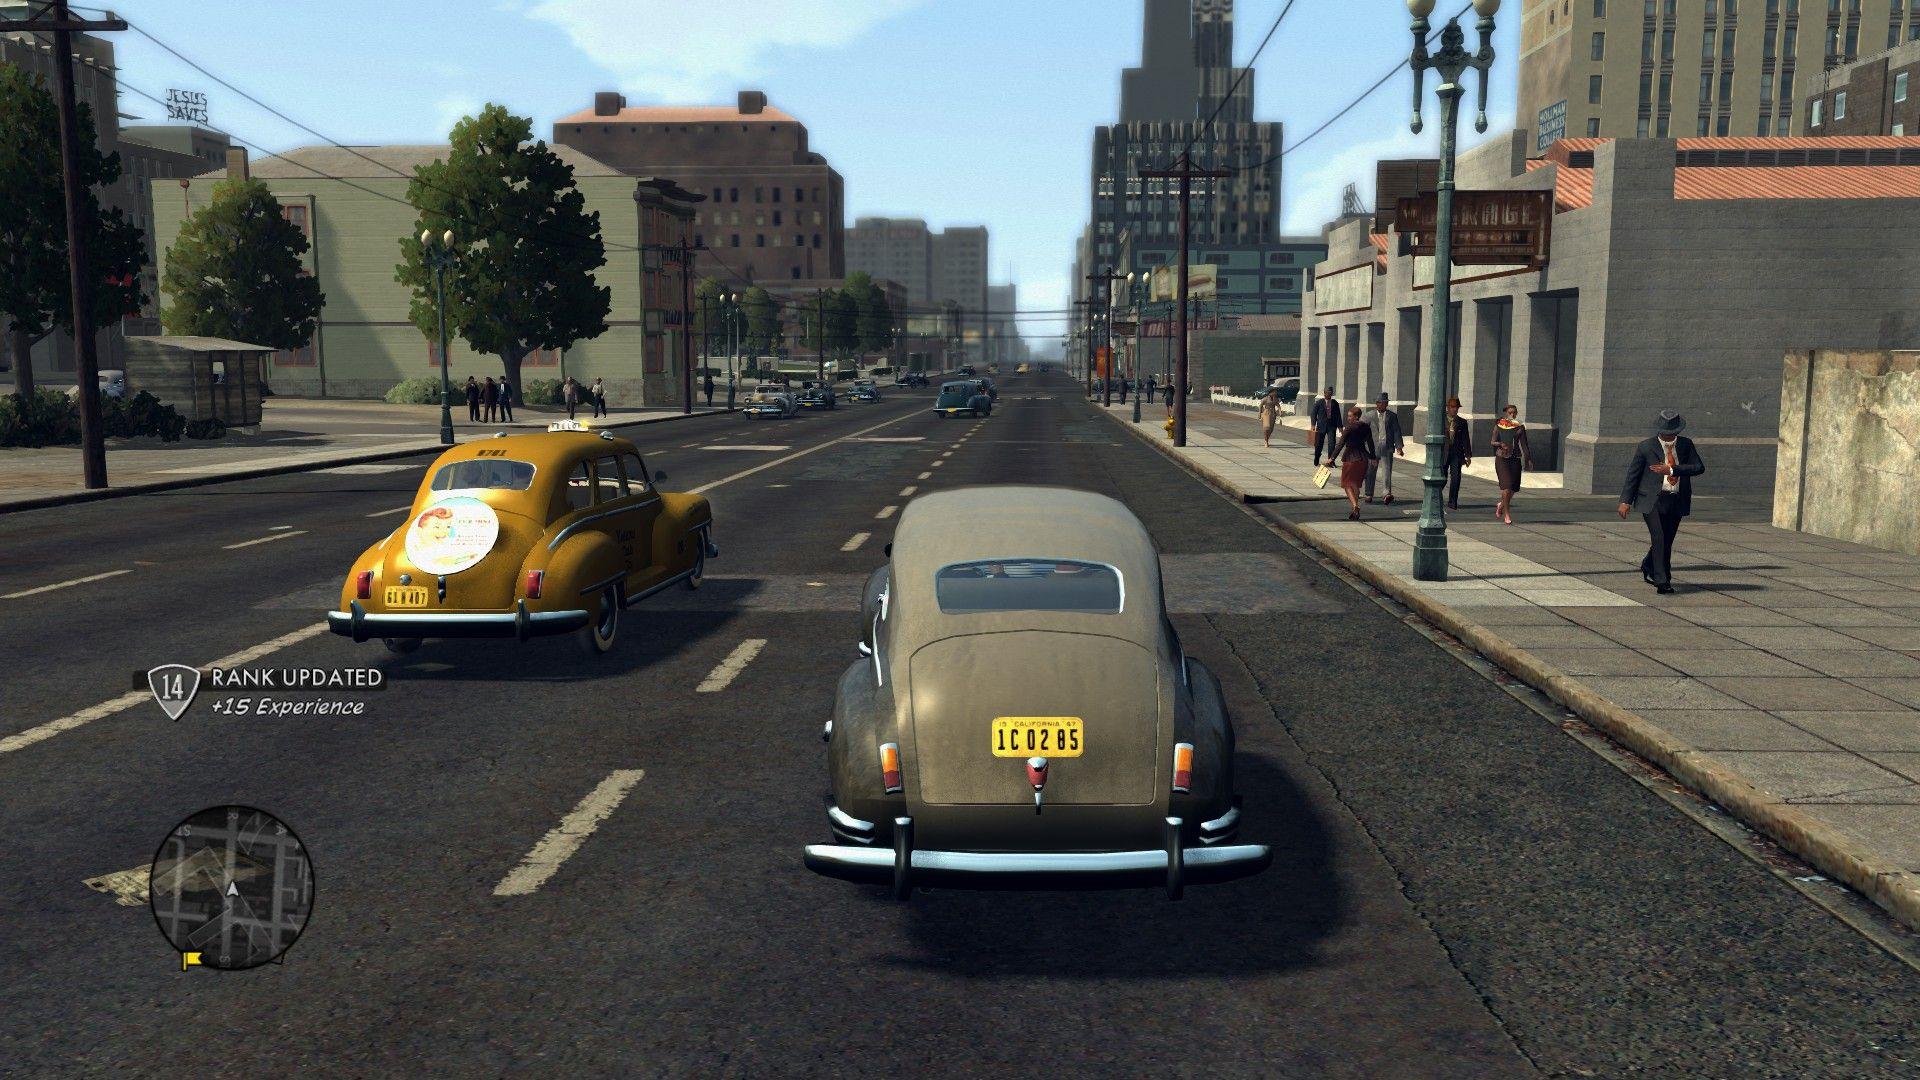 L.A. Noire Backgrounds on Wallpapers Vista